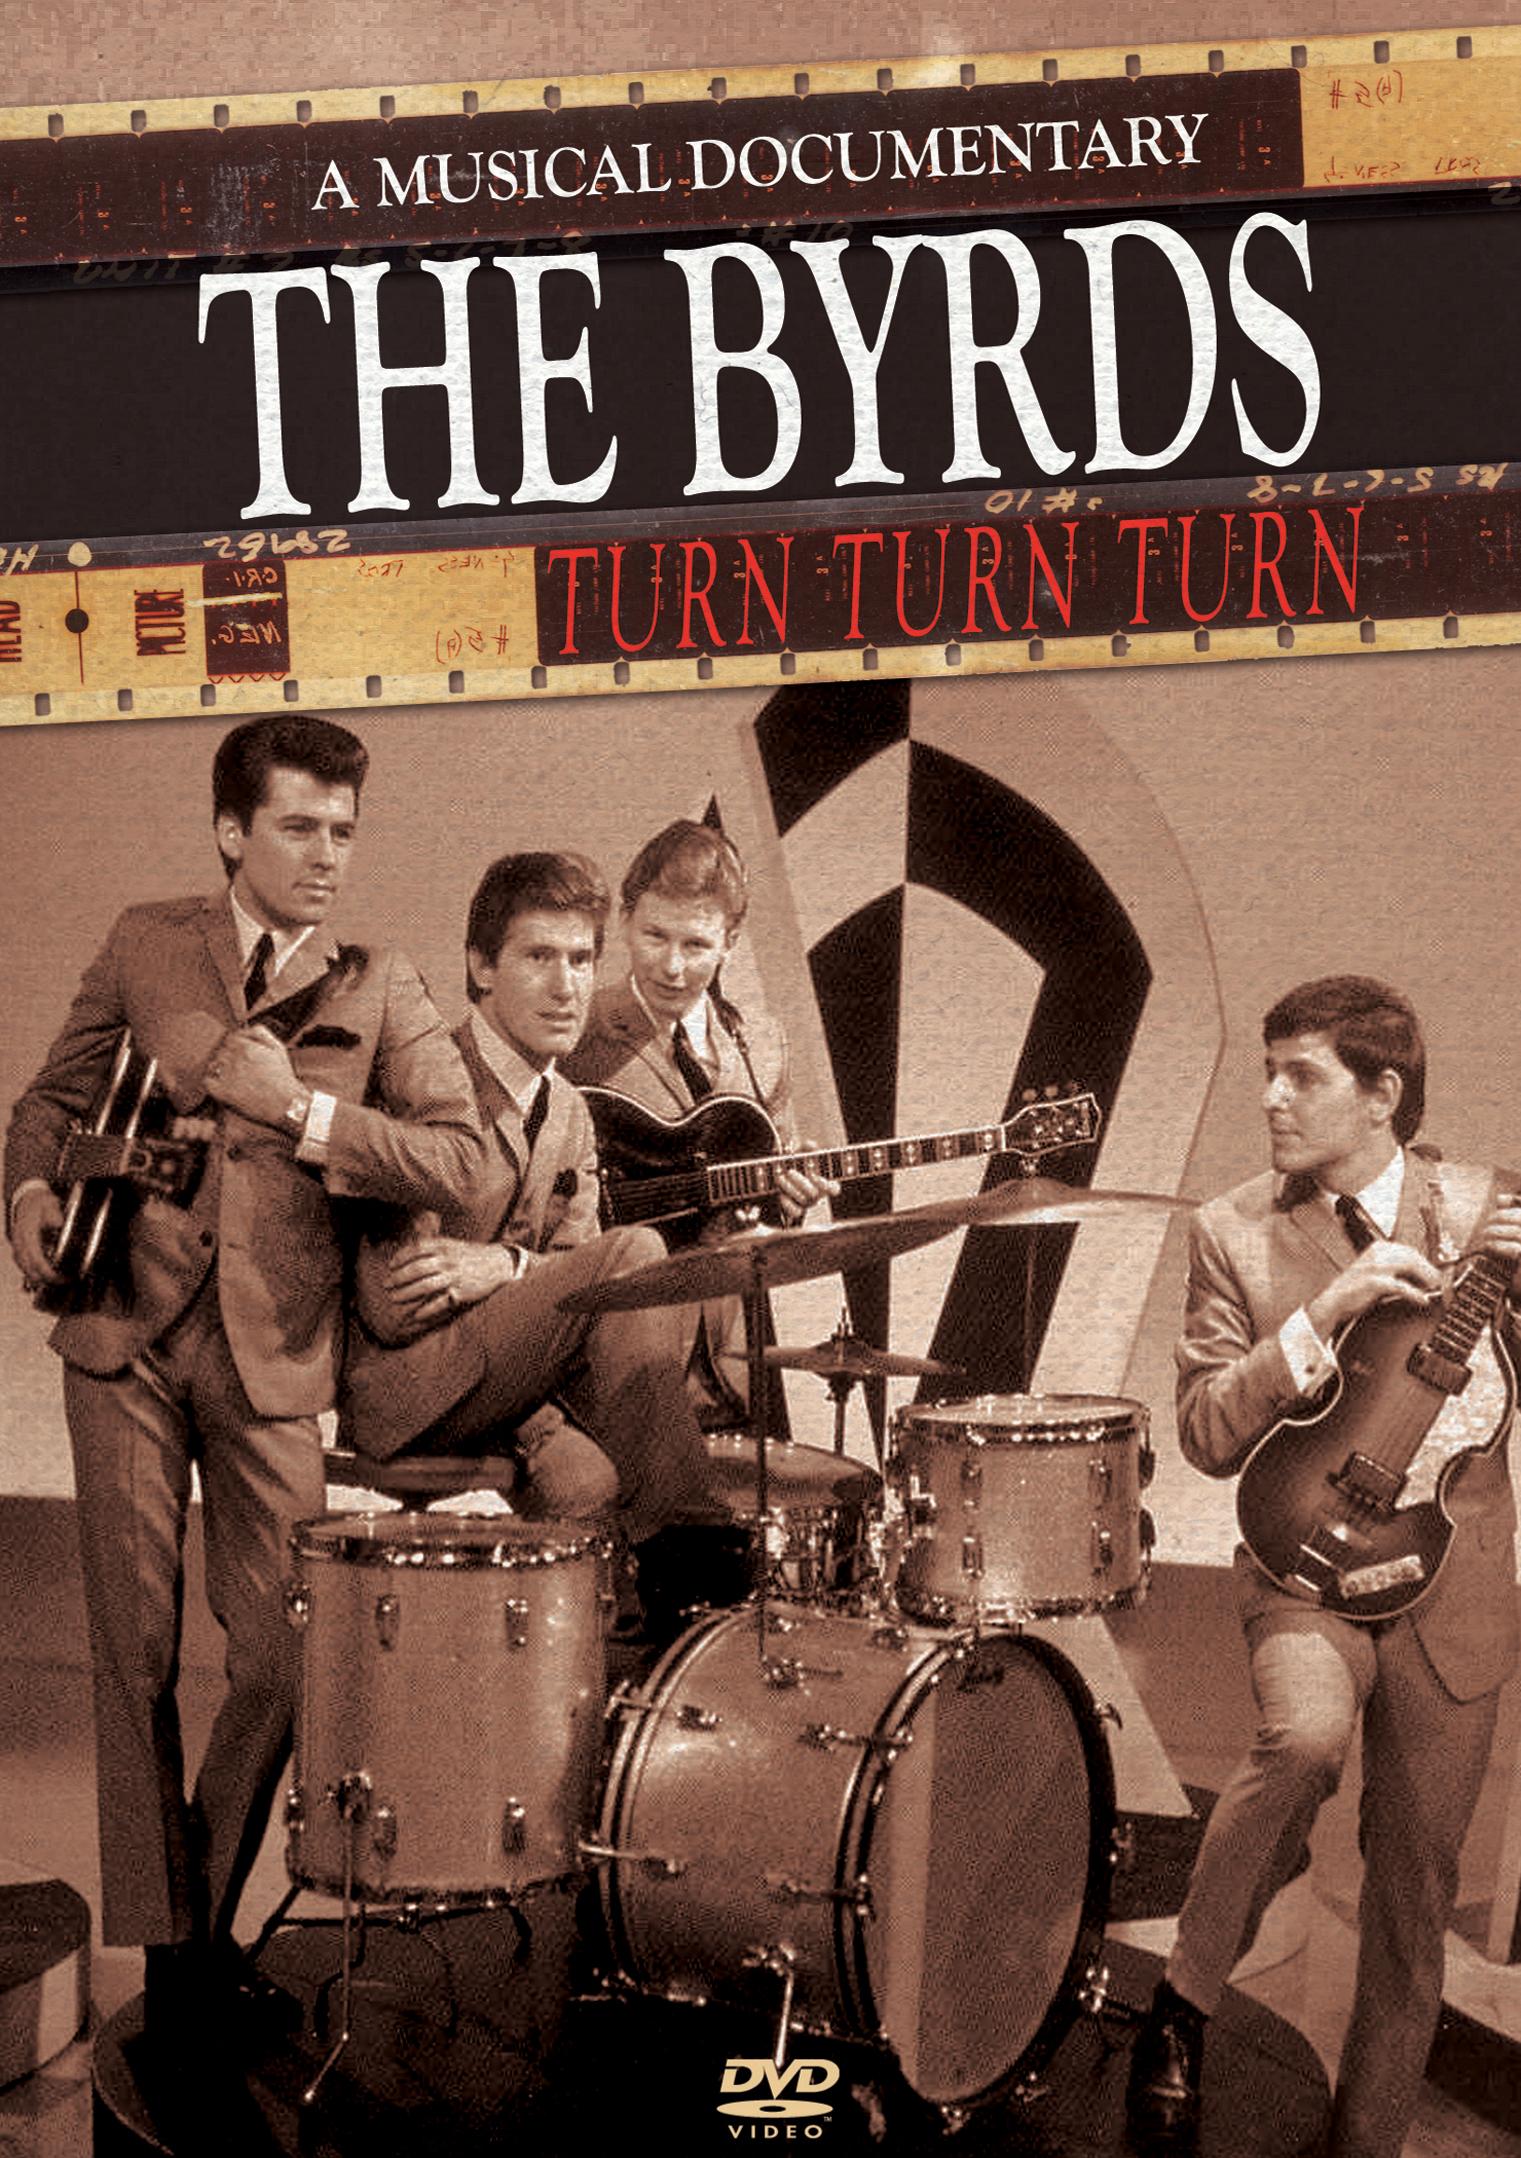 The Byrds: Turn Turn Turn